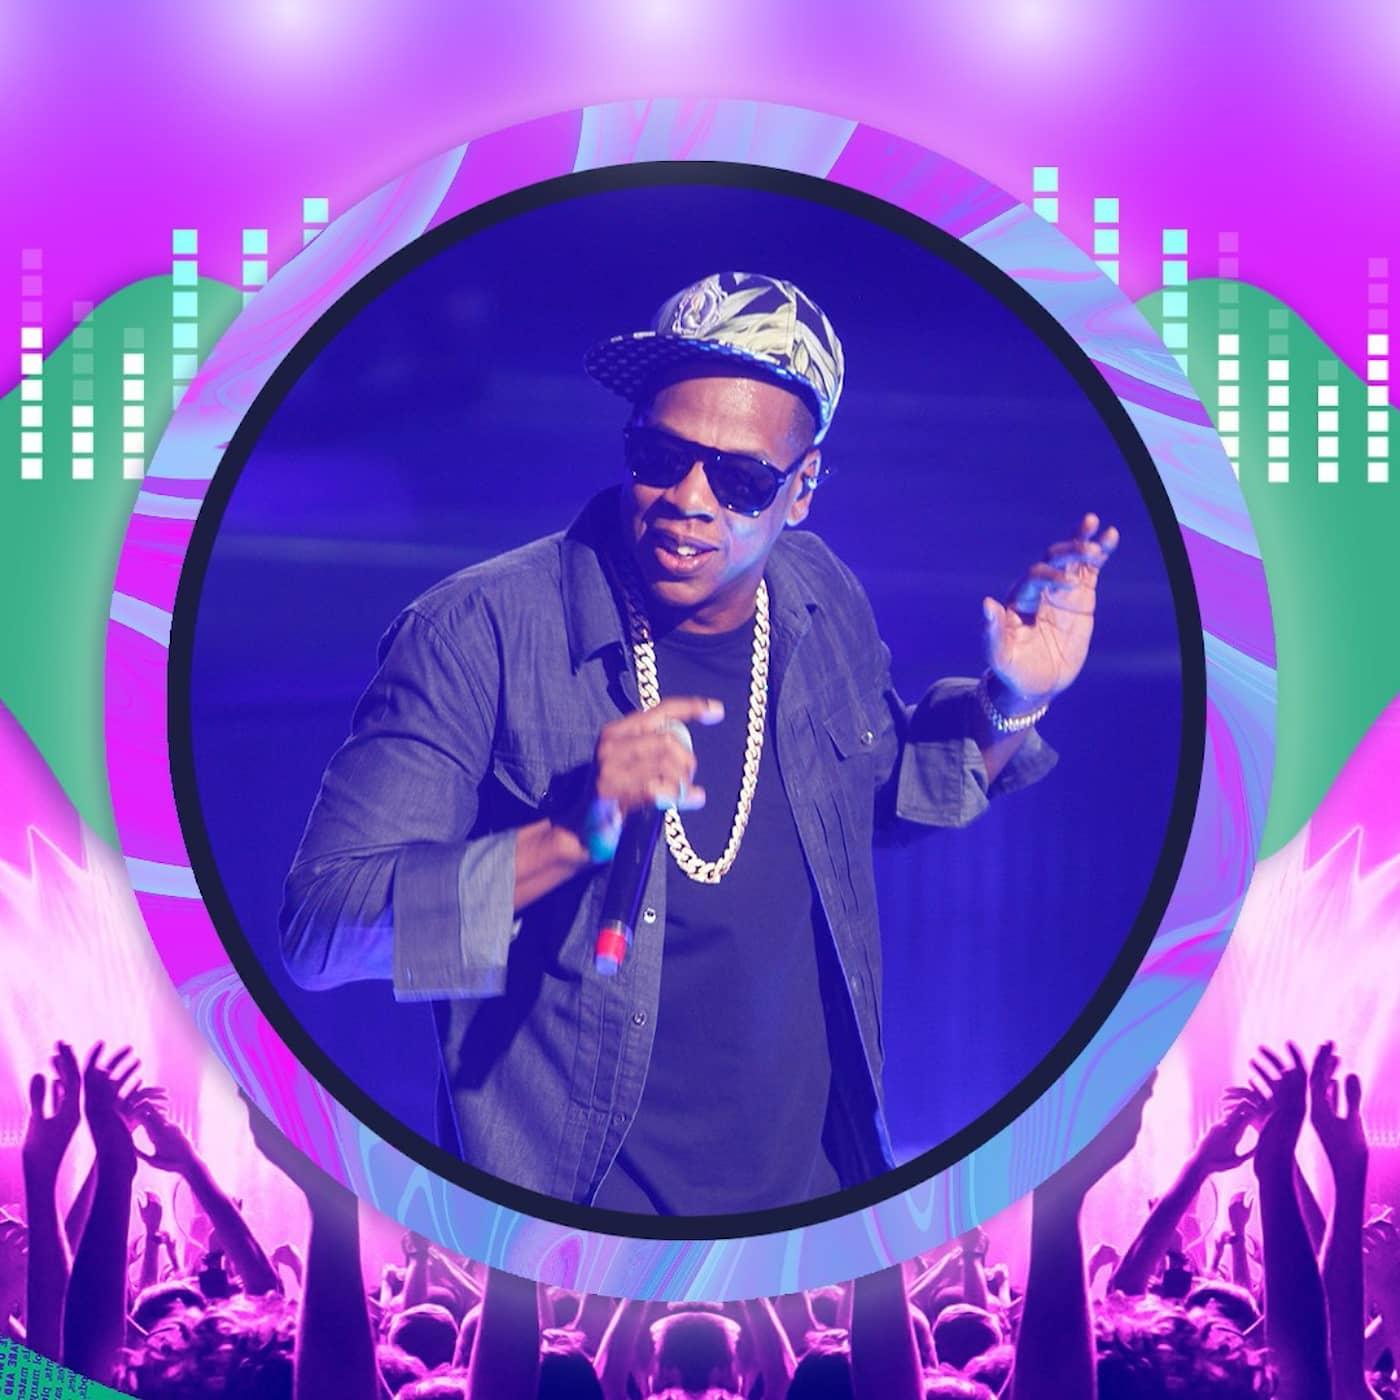 Jay-Z - hiphopens stora hustler